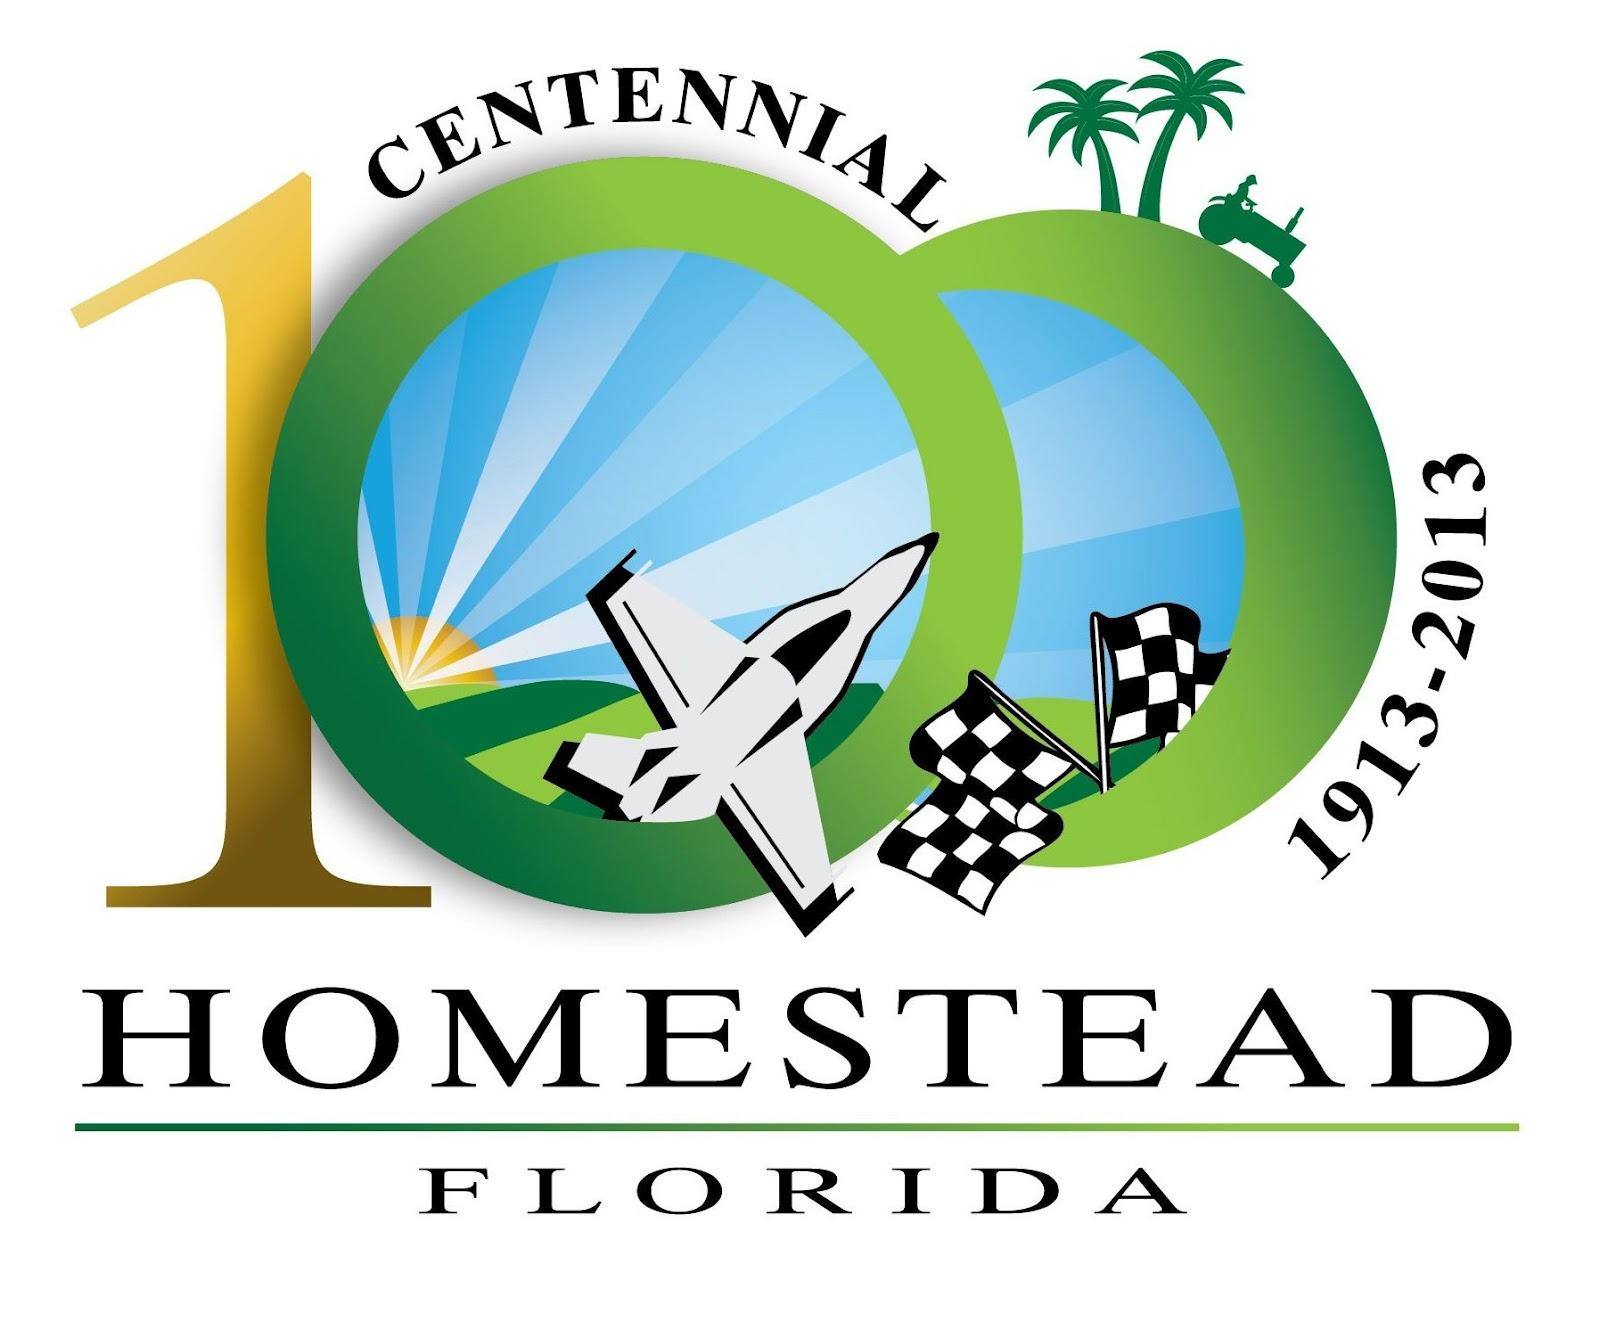 www.CityofHomestead.com